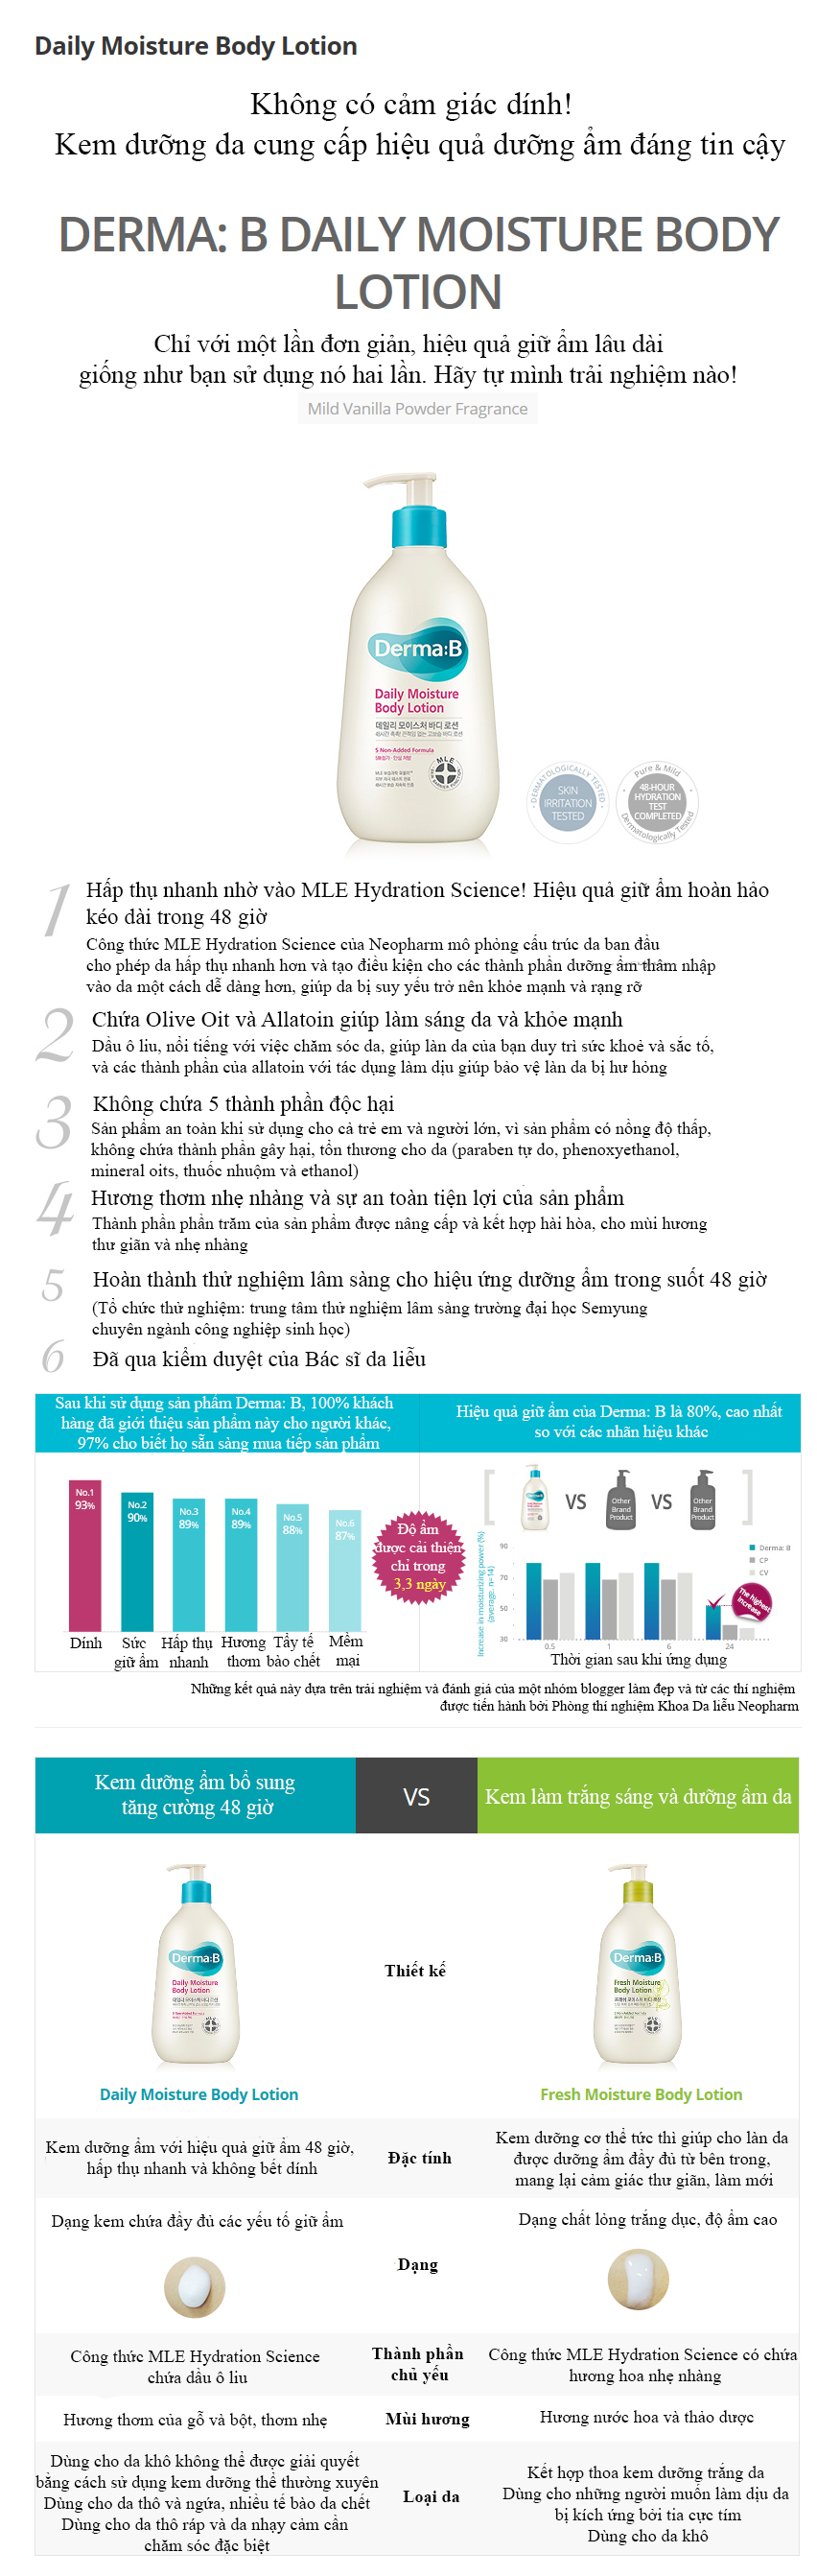 Derma:B Daily Moisture Body Lotion 400ml